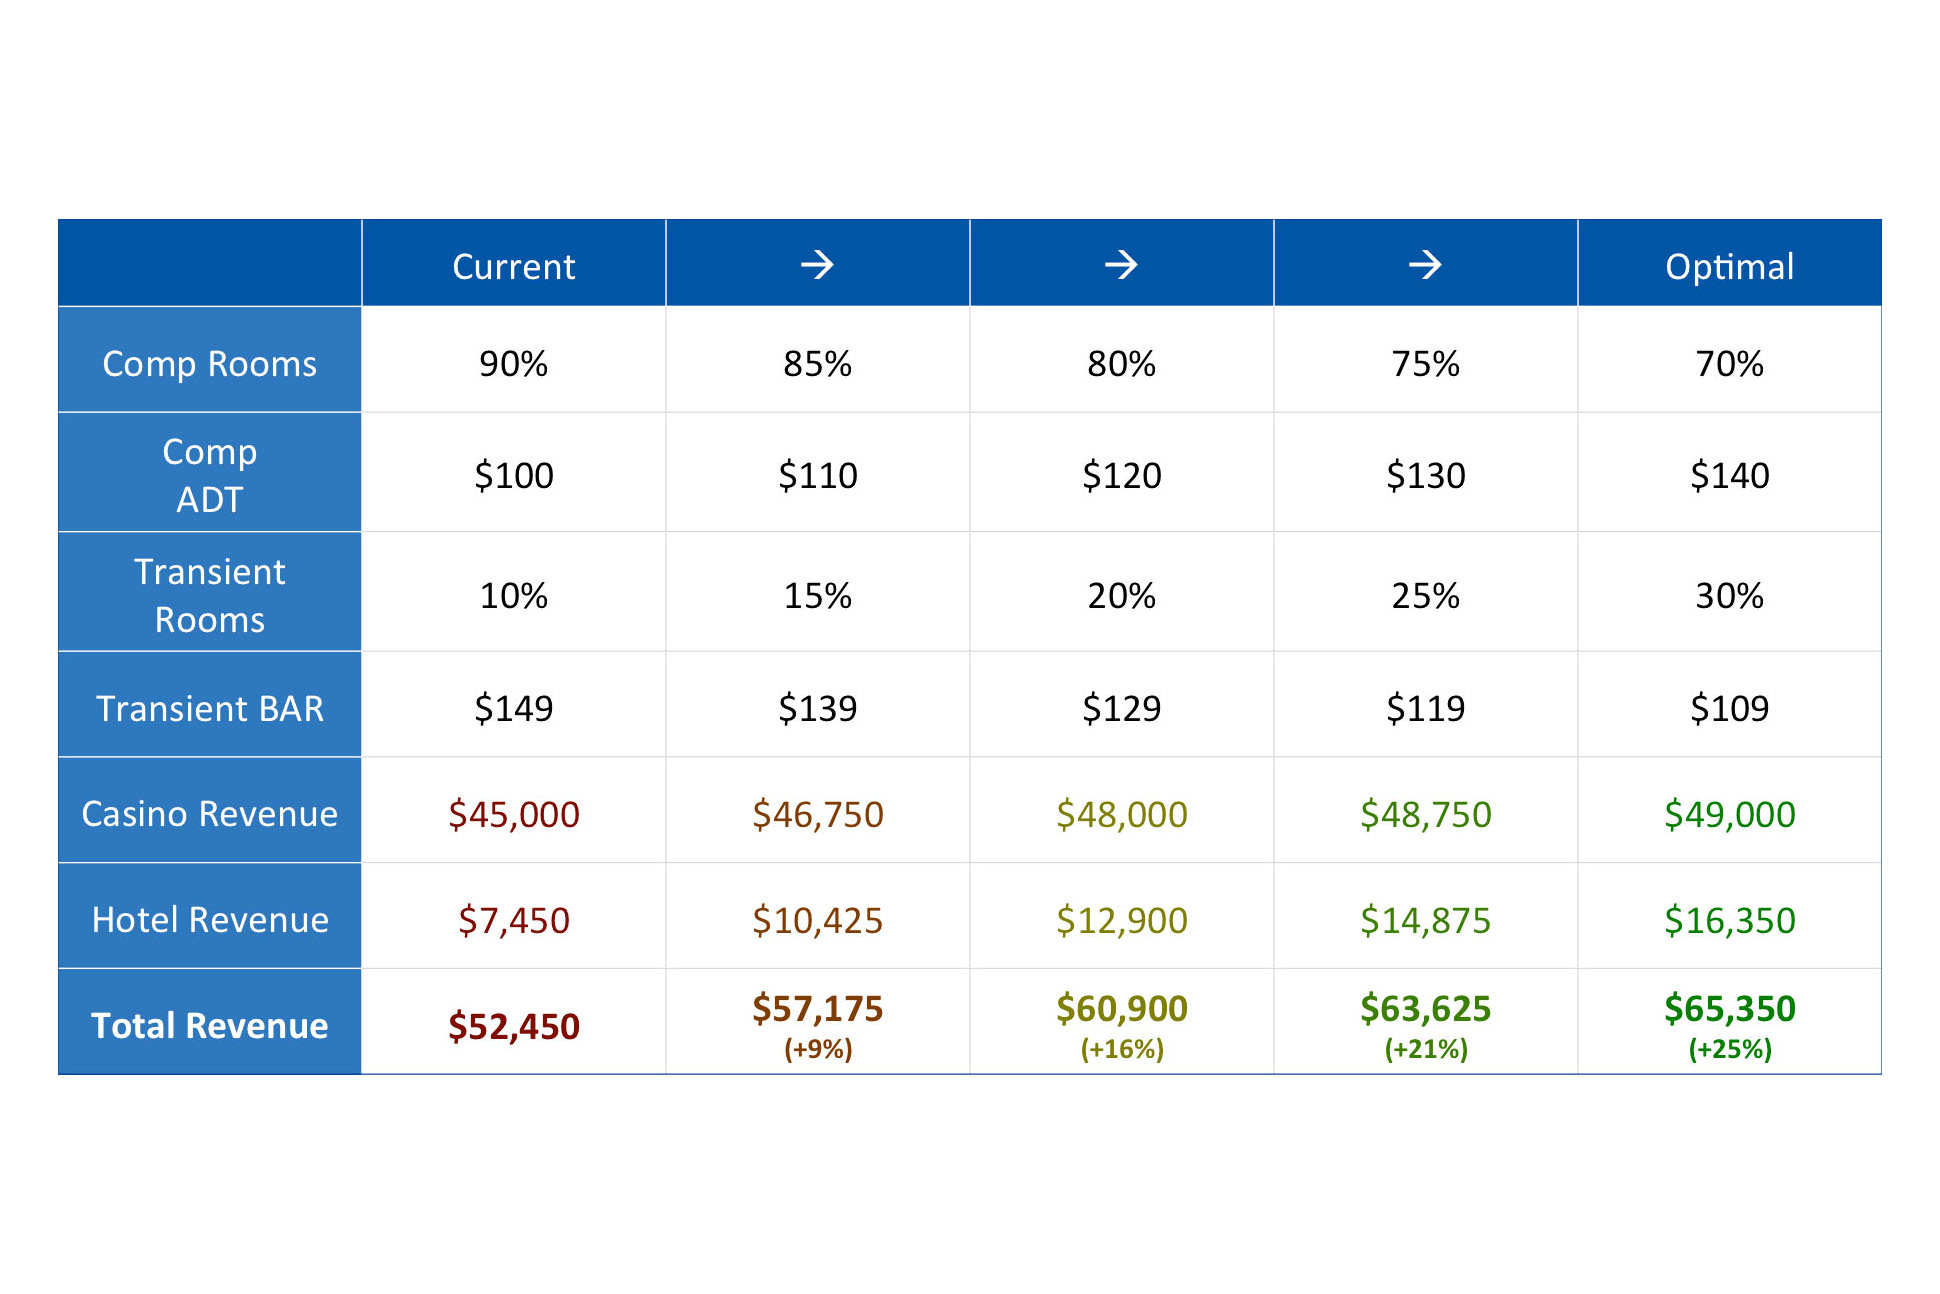 chart-optimize-casino-profit